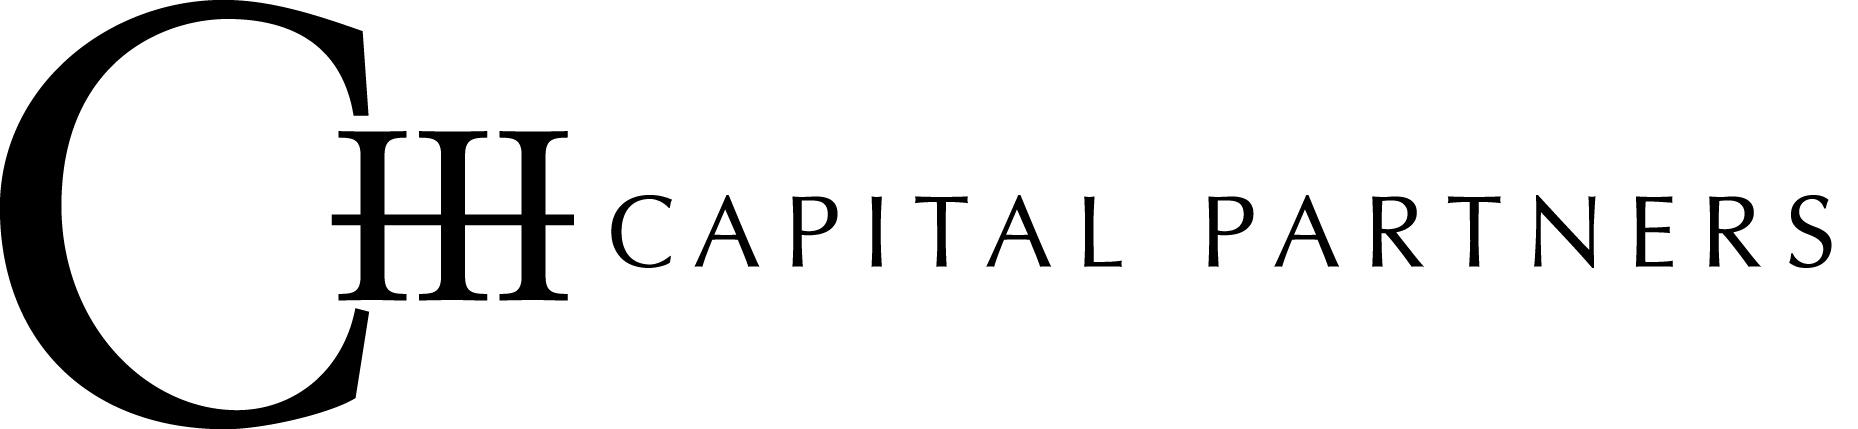 About C Iii Capital Partners Andrewfarkasnet